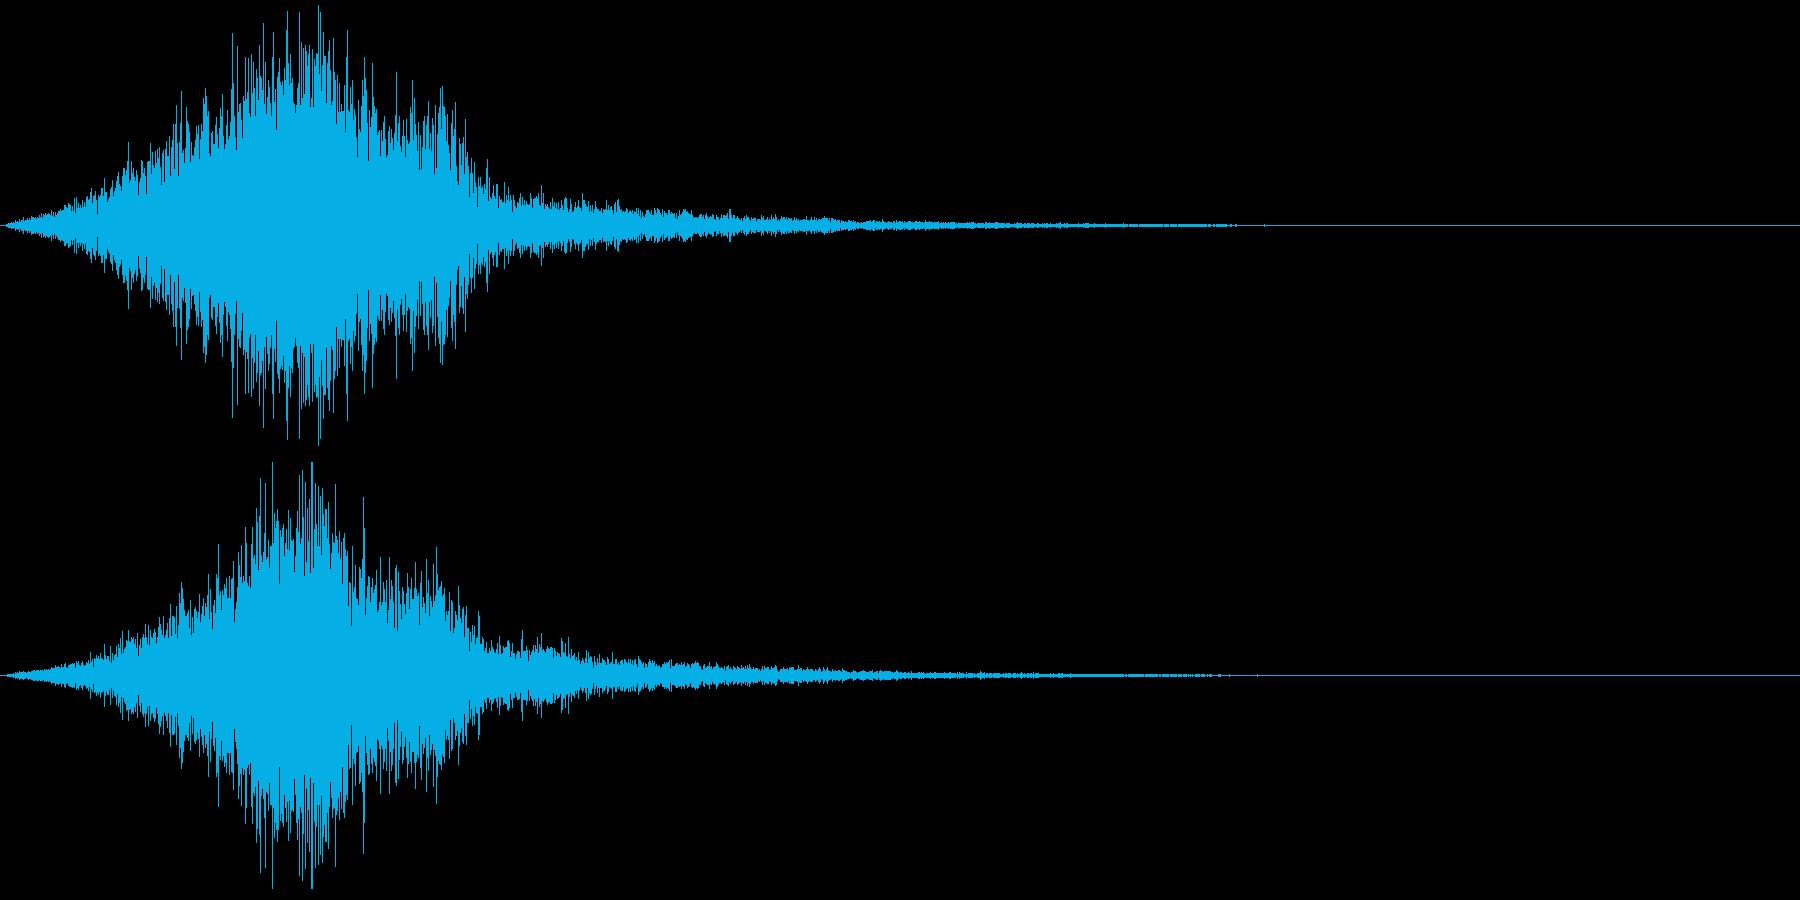 【SE 効果音】不気味な音9の再生済みの波形